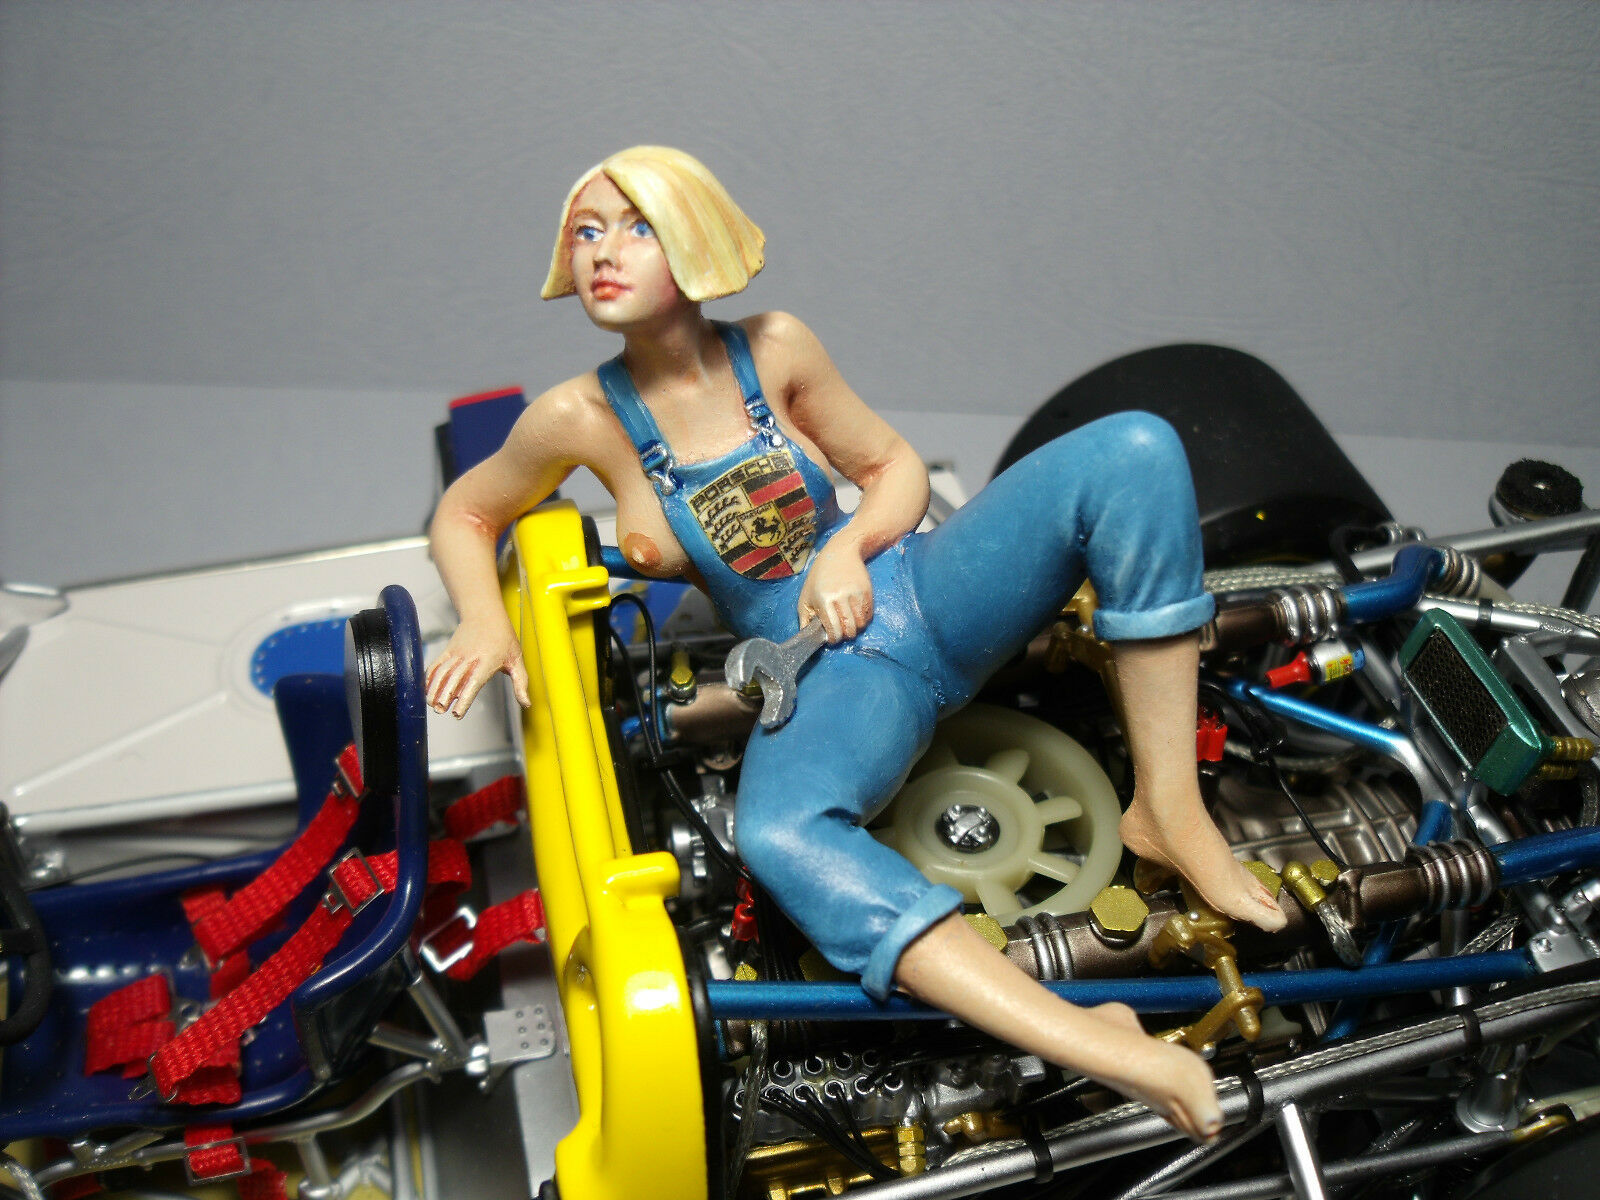 1 18  FIGURE  UTE  THE  PORSCHE  GIRL  VROOM  UNPAINTED  FOR  EXOTO  SPARK  1 18